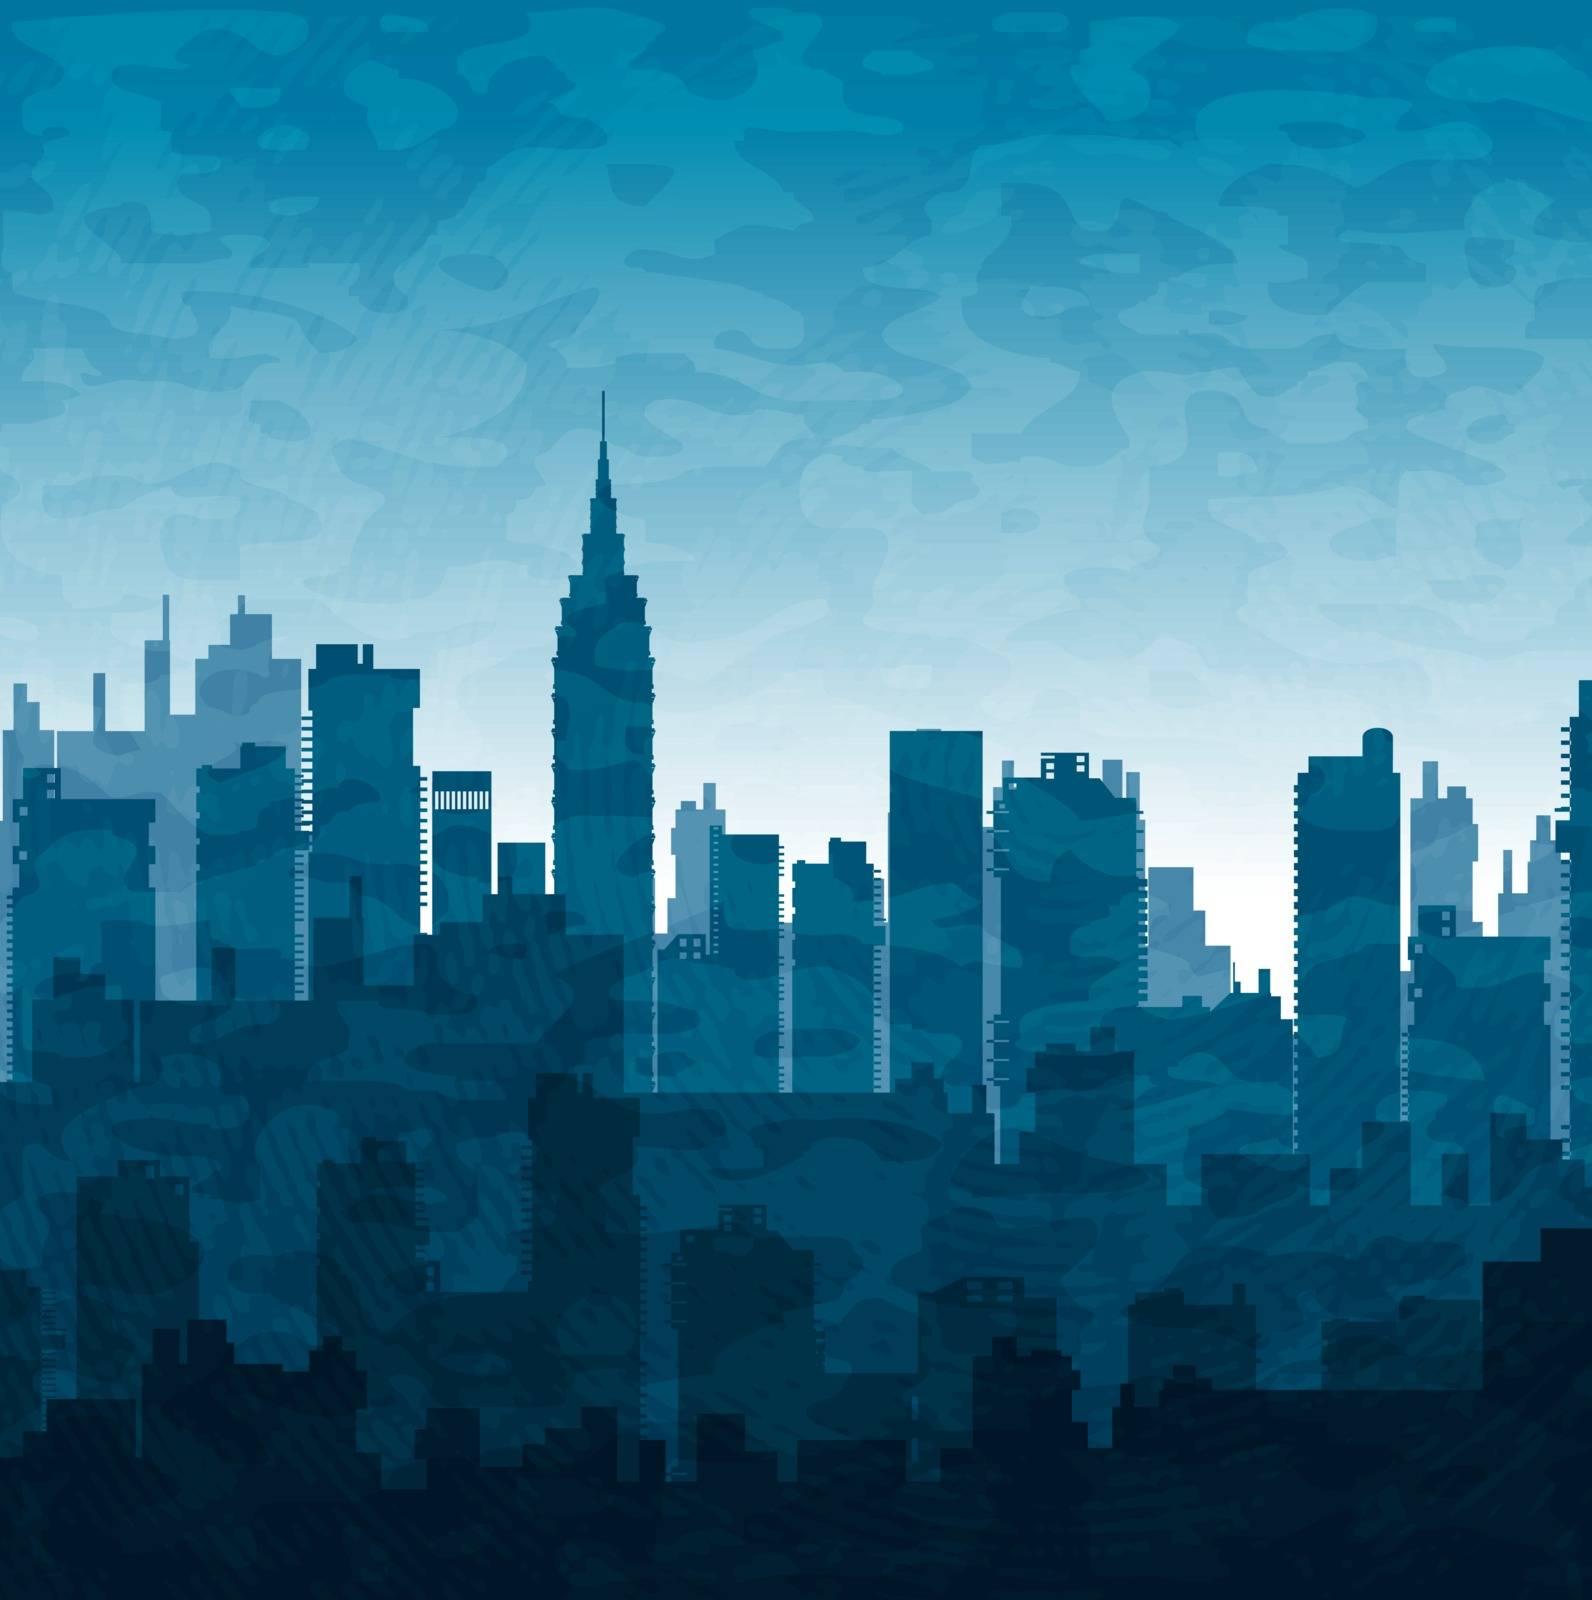 Silhouette of city skyscrapers buildings in blue tones